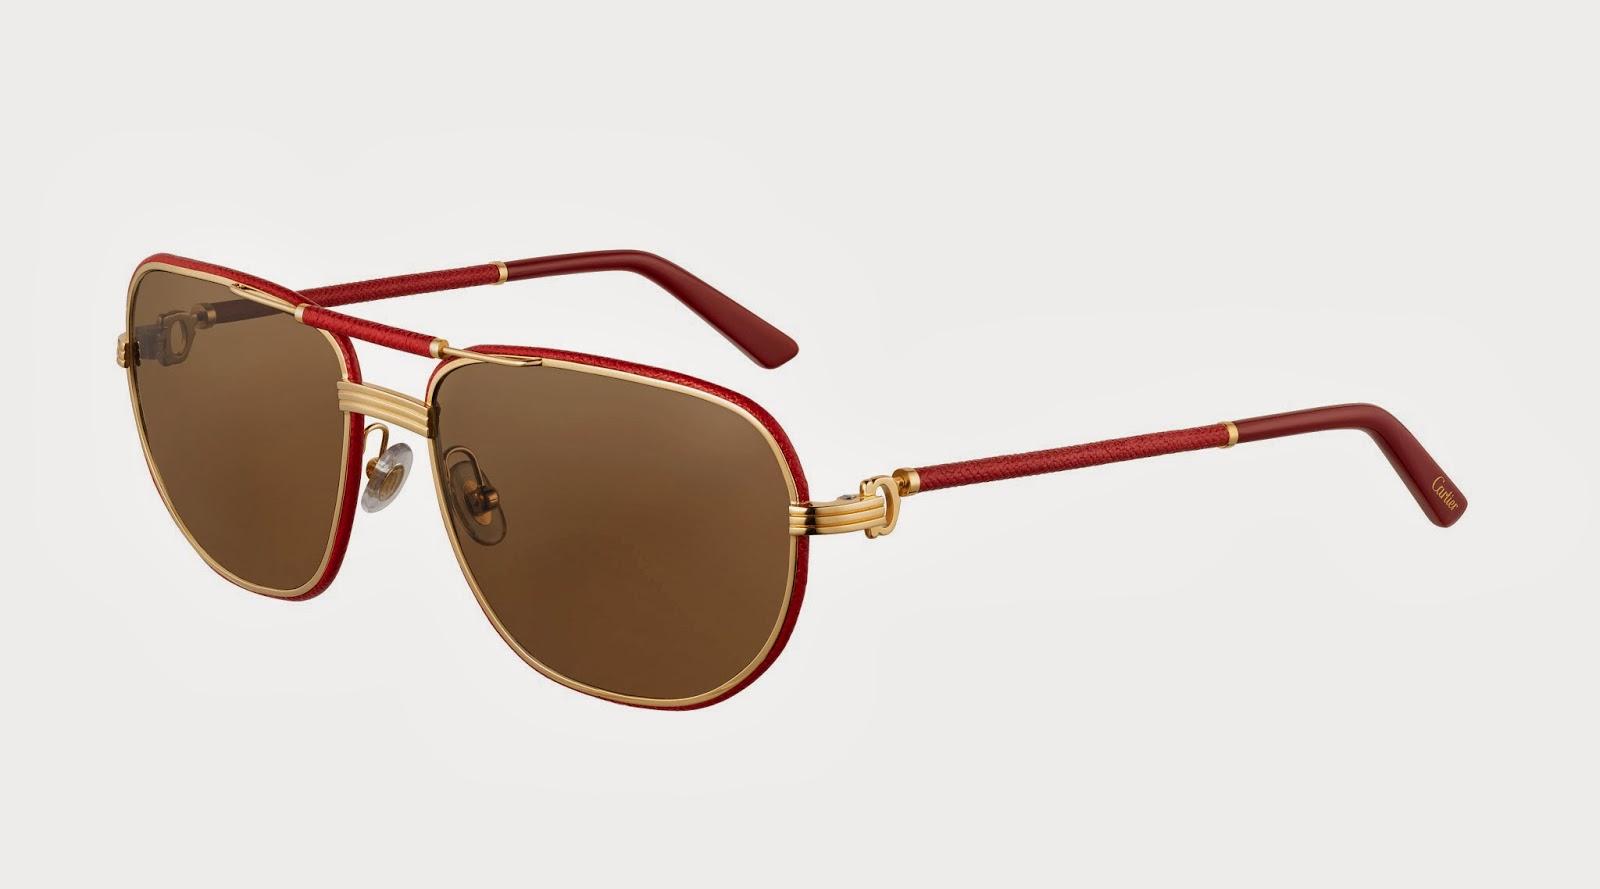 7bcb1b9af7 Cartier Sunglasses Limited Edition 2013